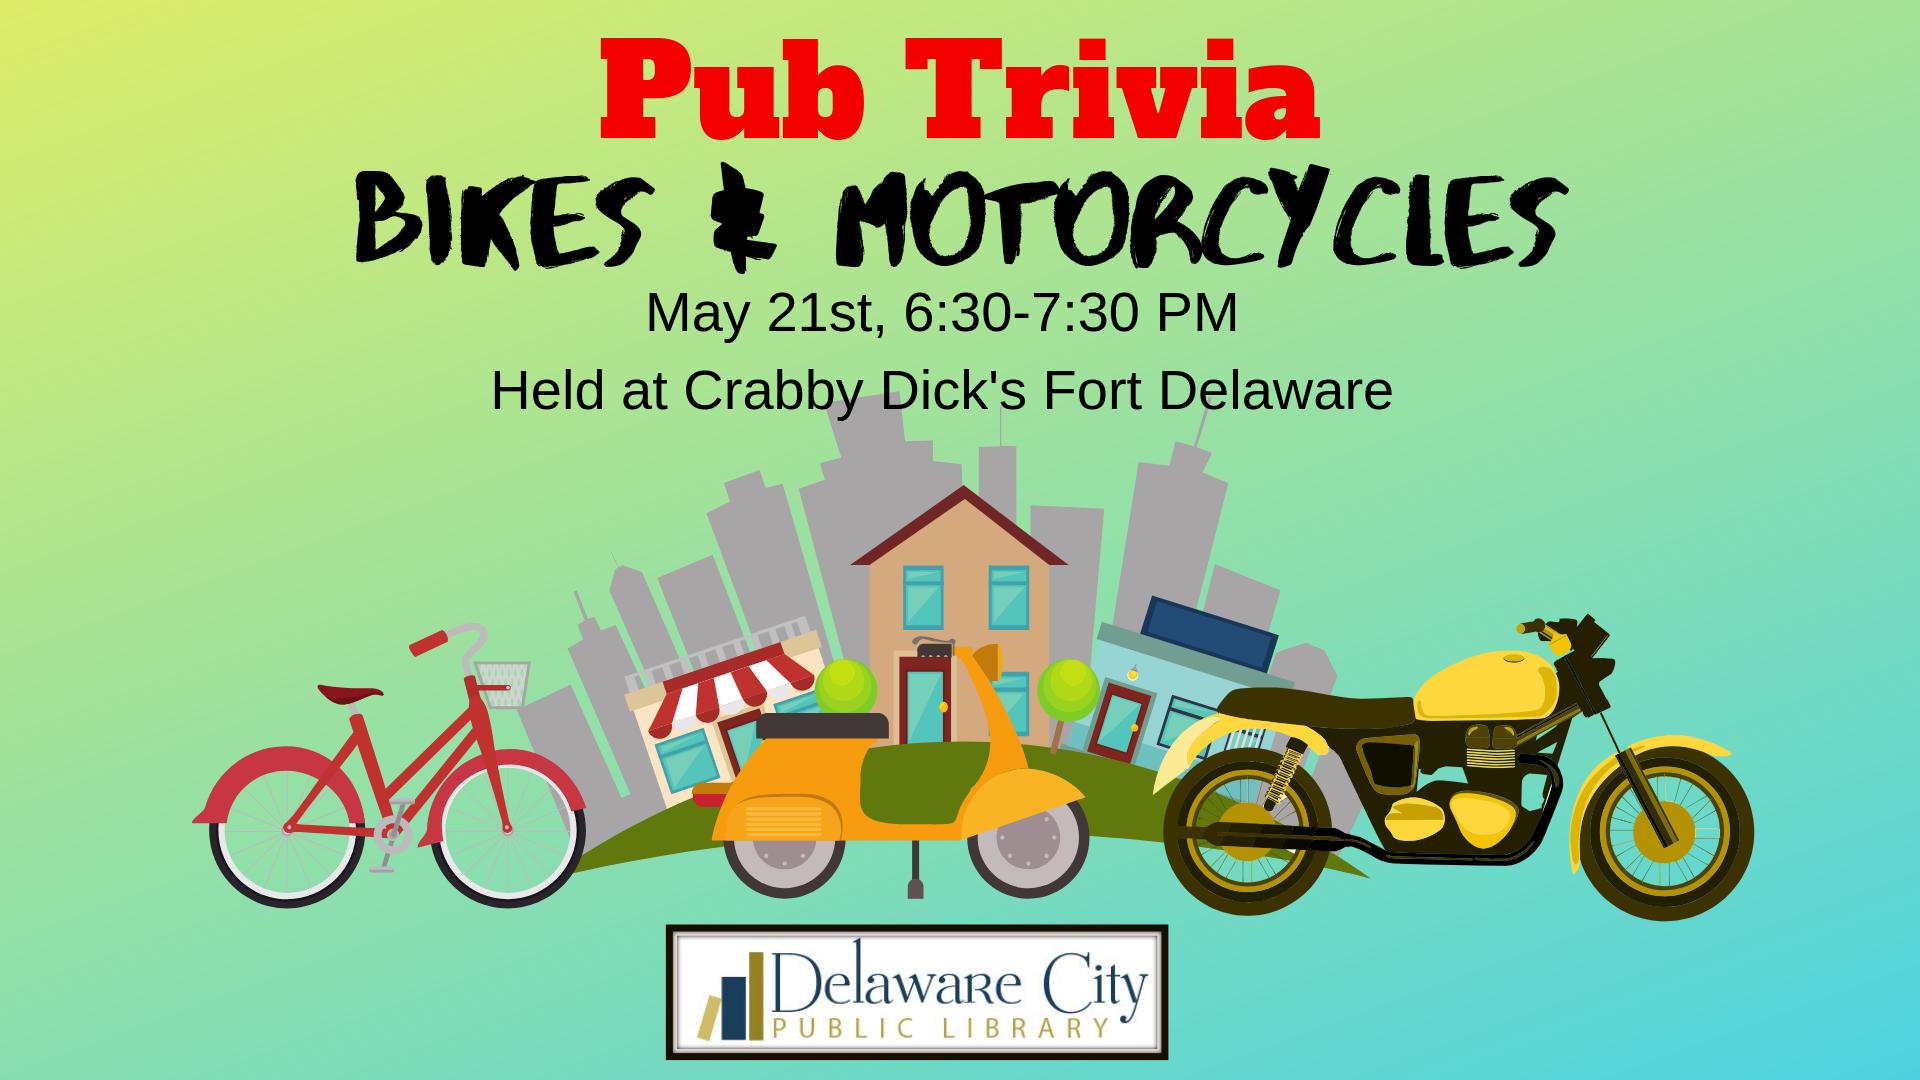 Pub Trivia: Bikes & Motorcycles